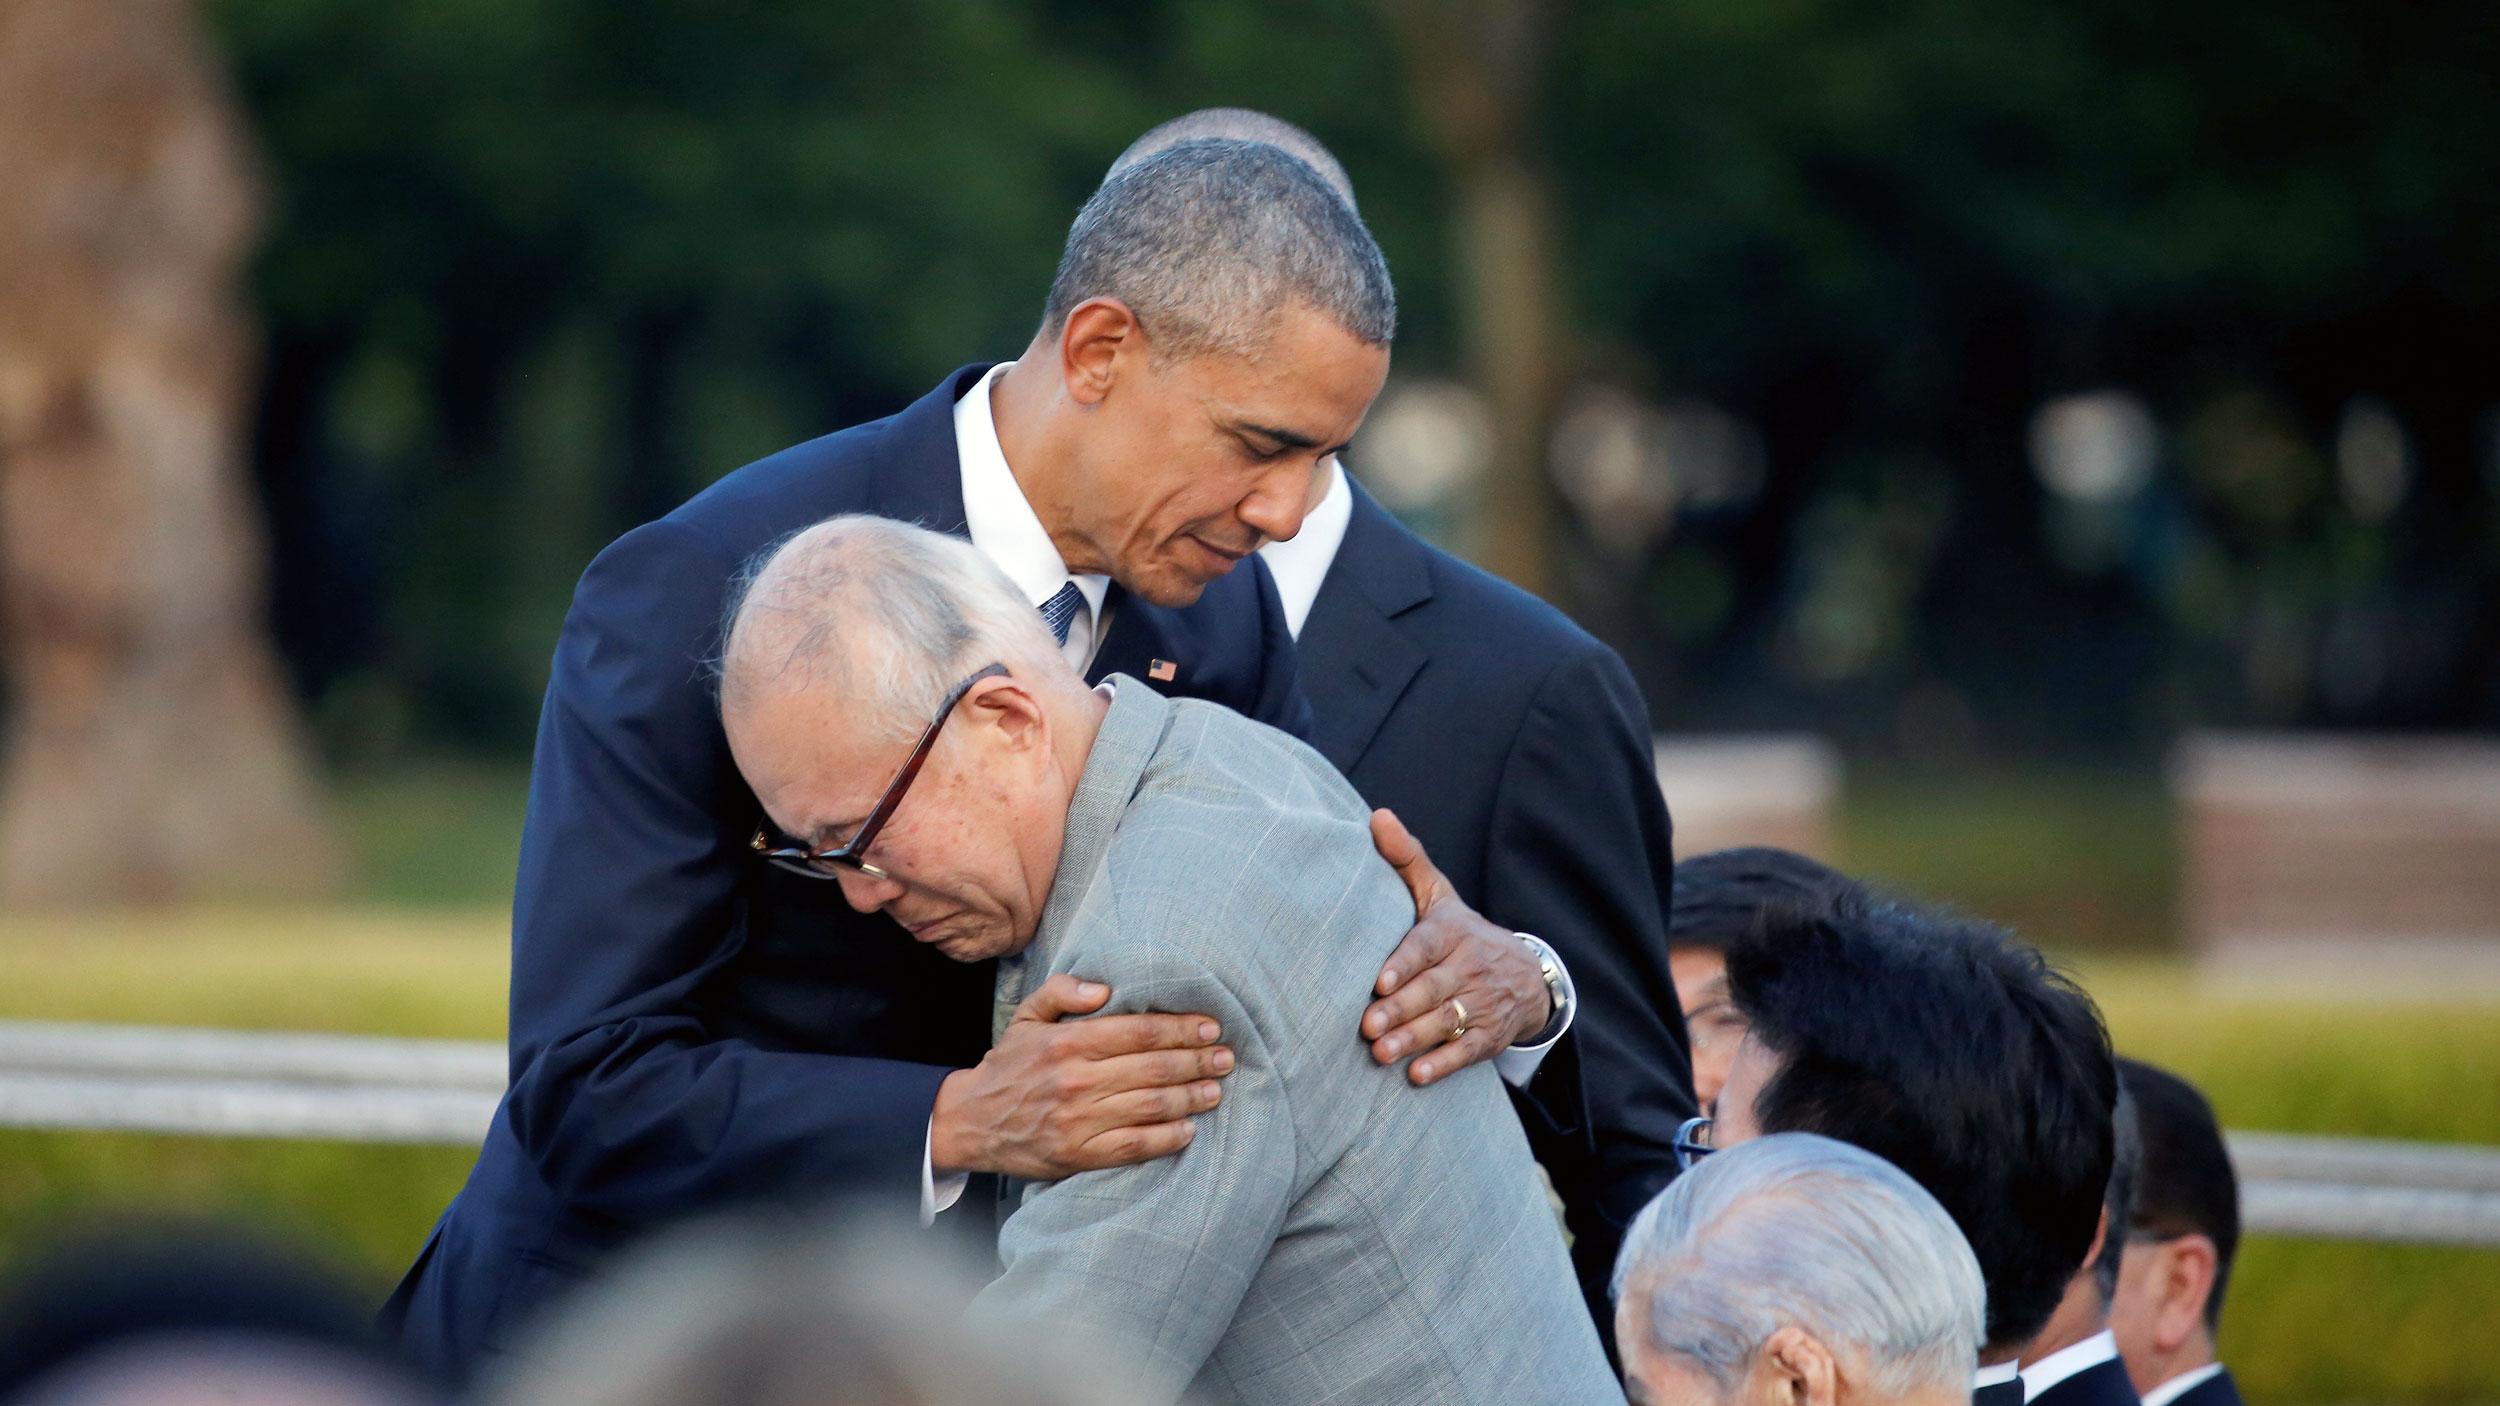 An older Japanese man hugs former President Barack Obama